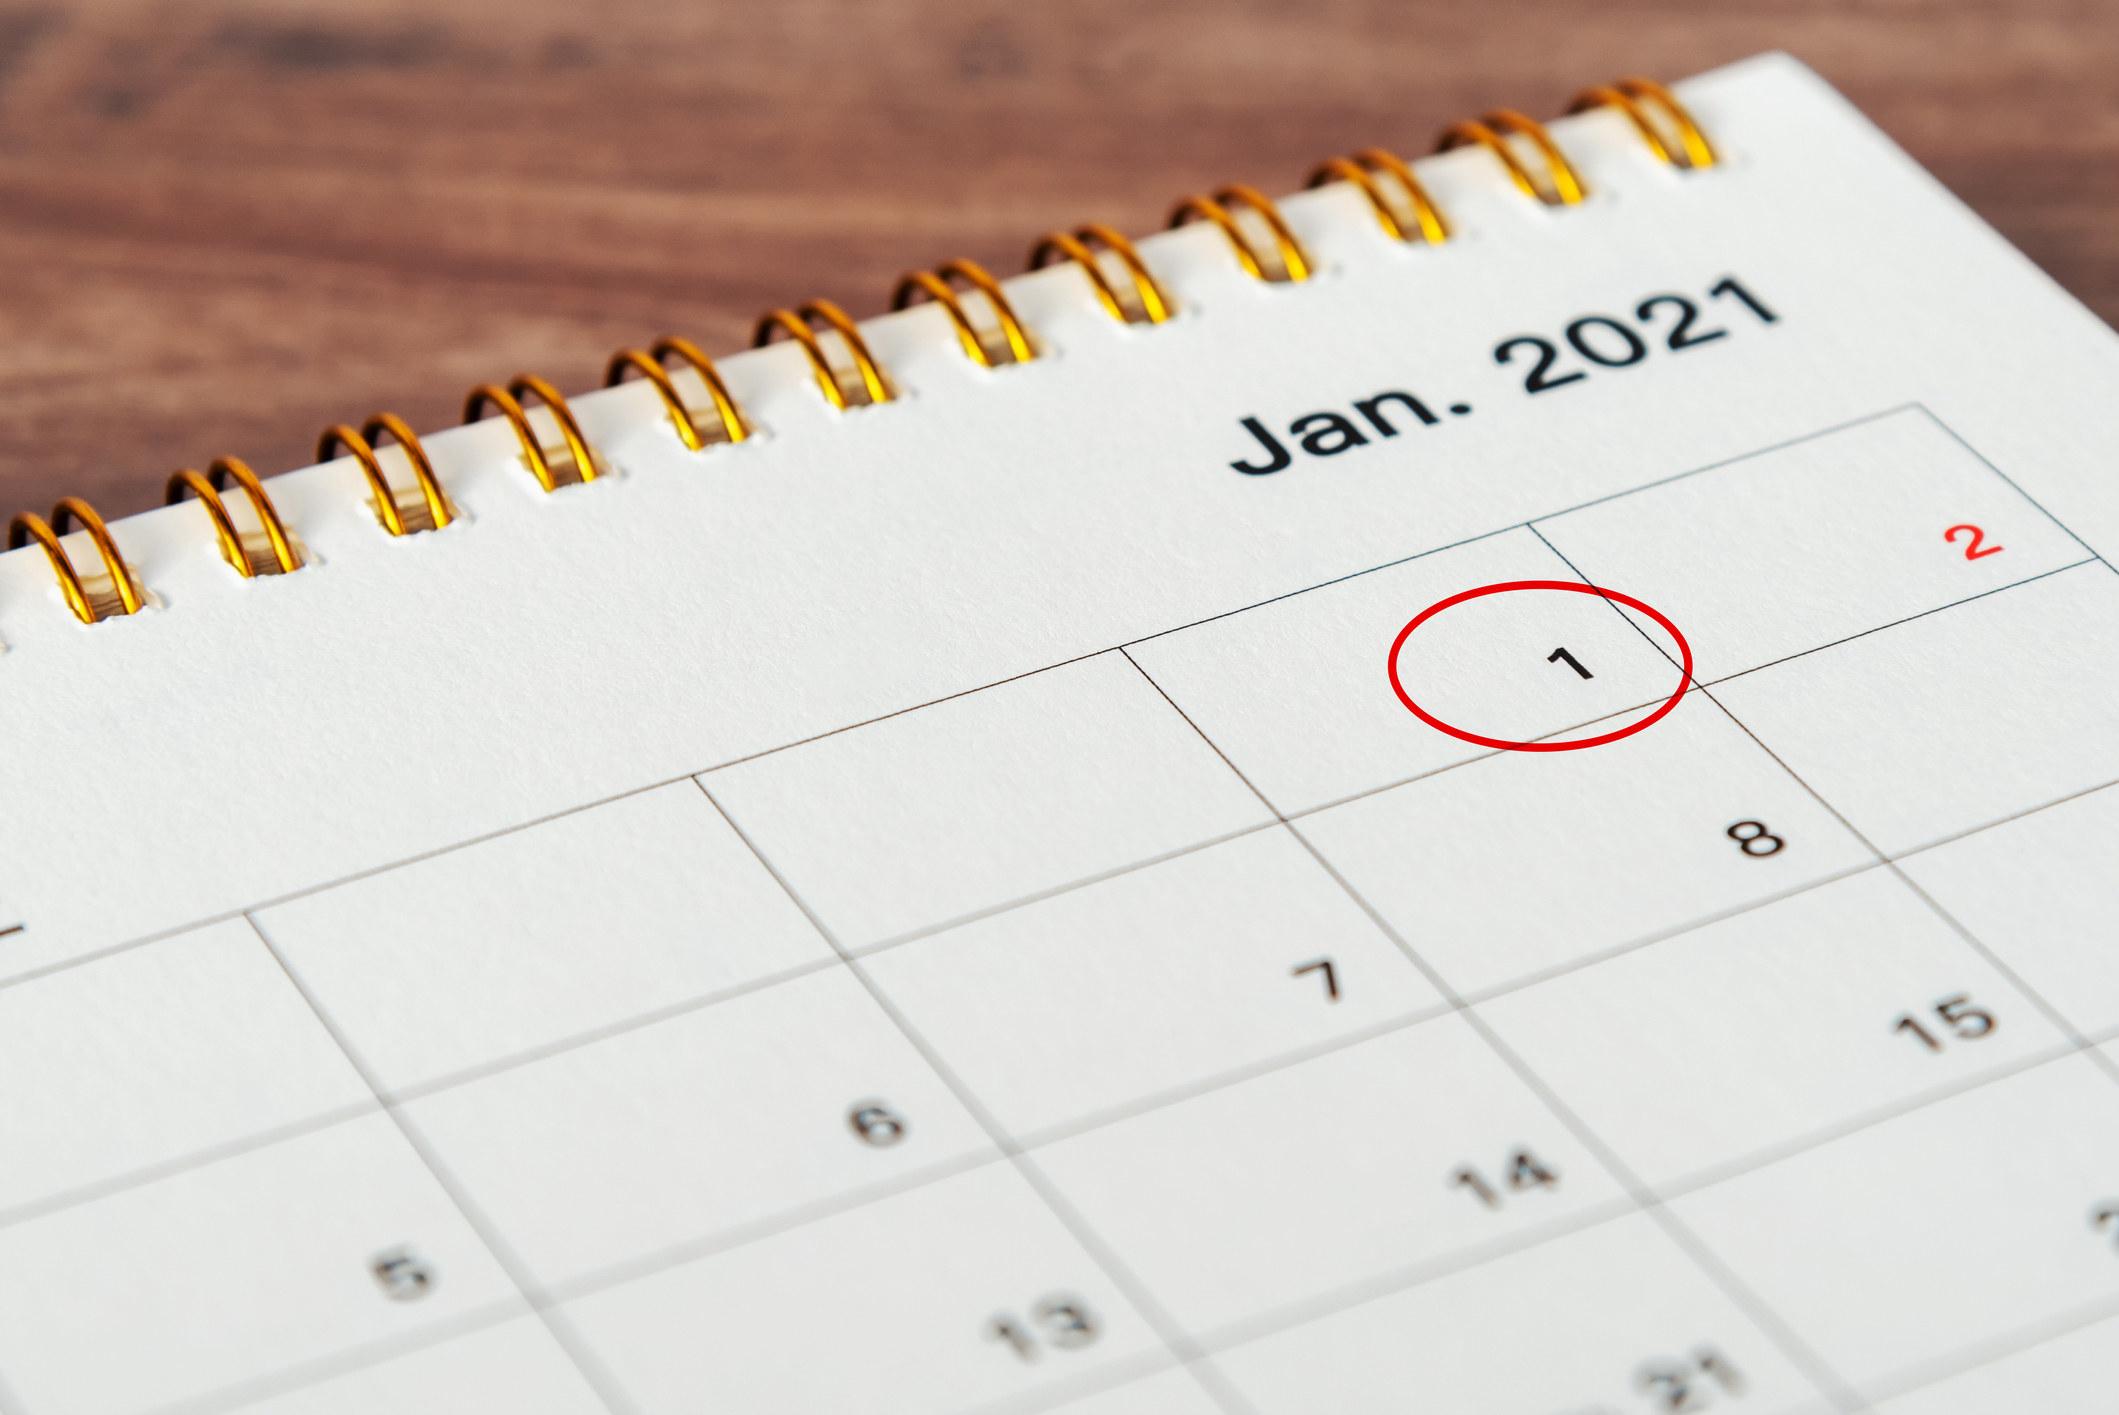 A calendar with January 1st circled